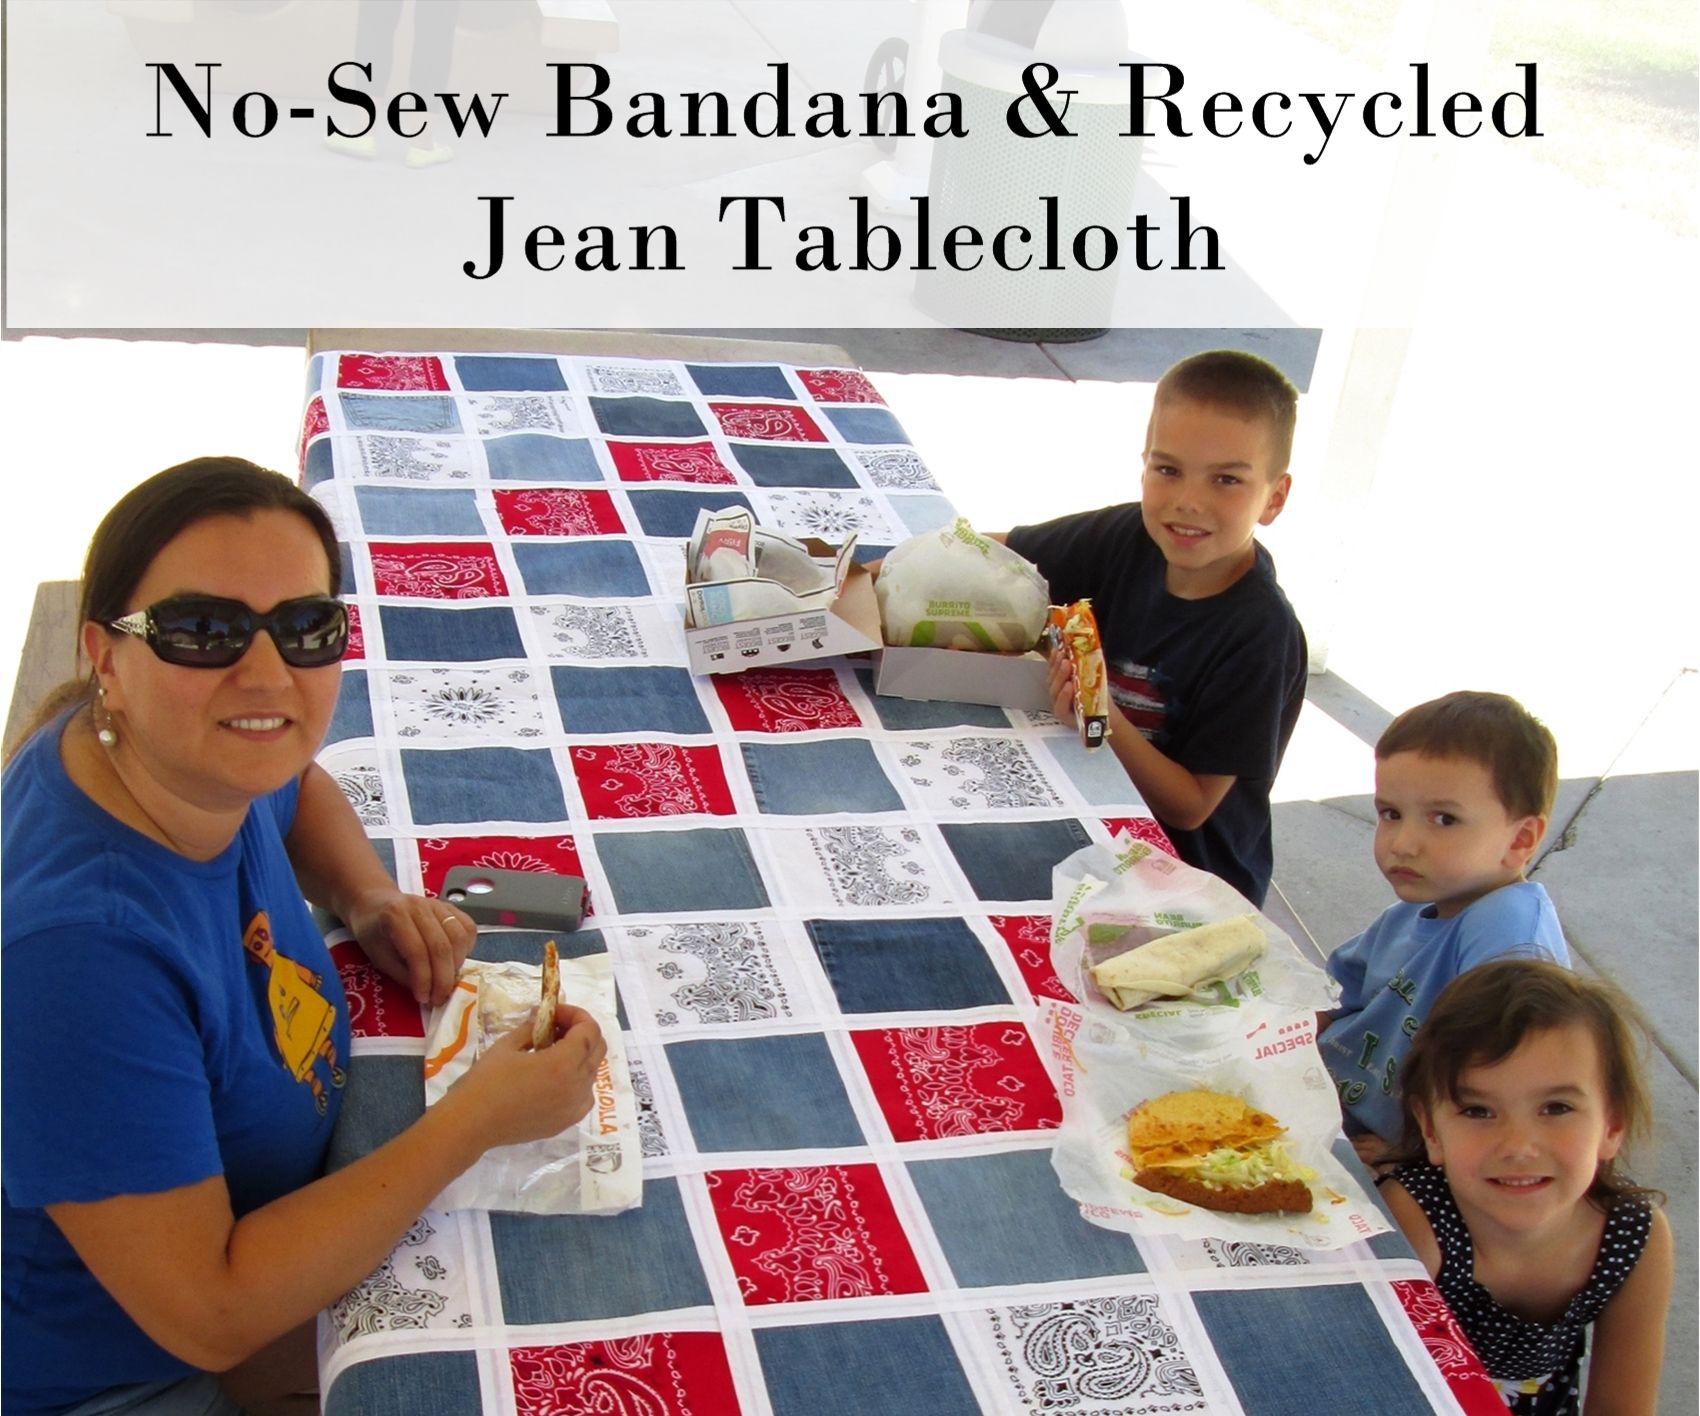 No-Sew Bandana & Recycled Jean Table Cloth